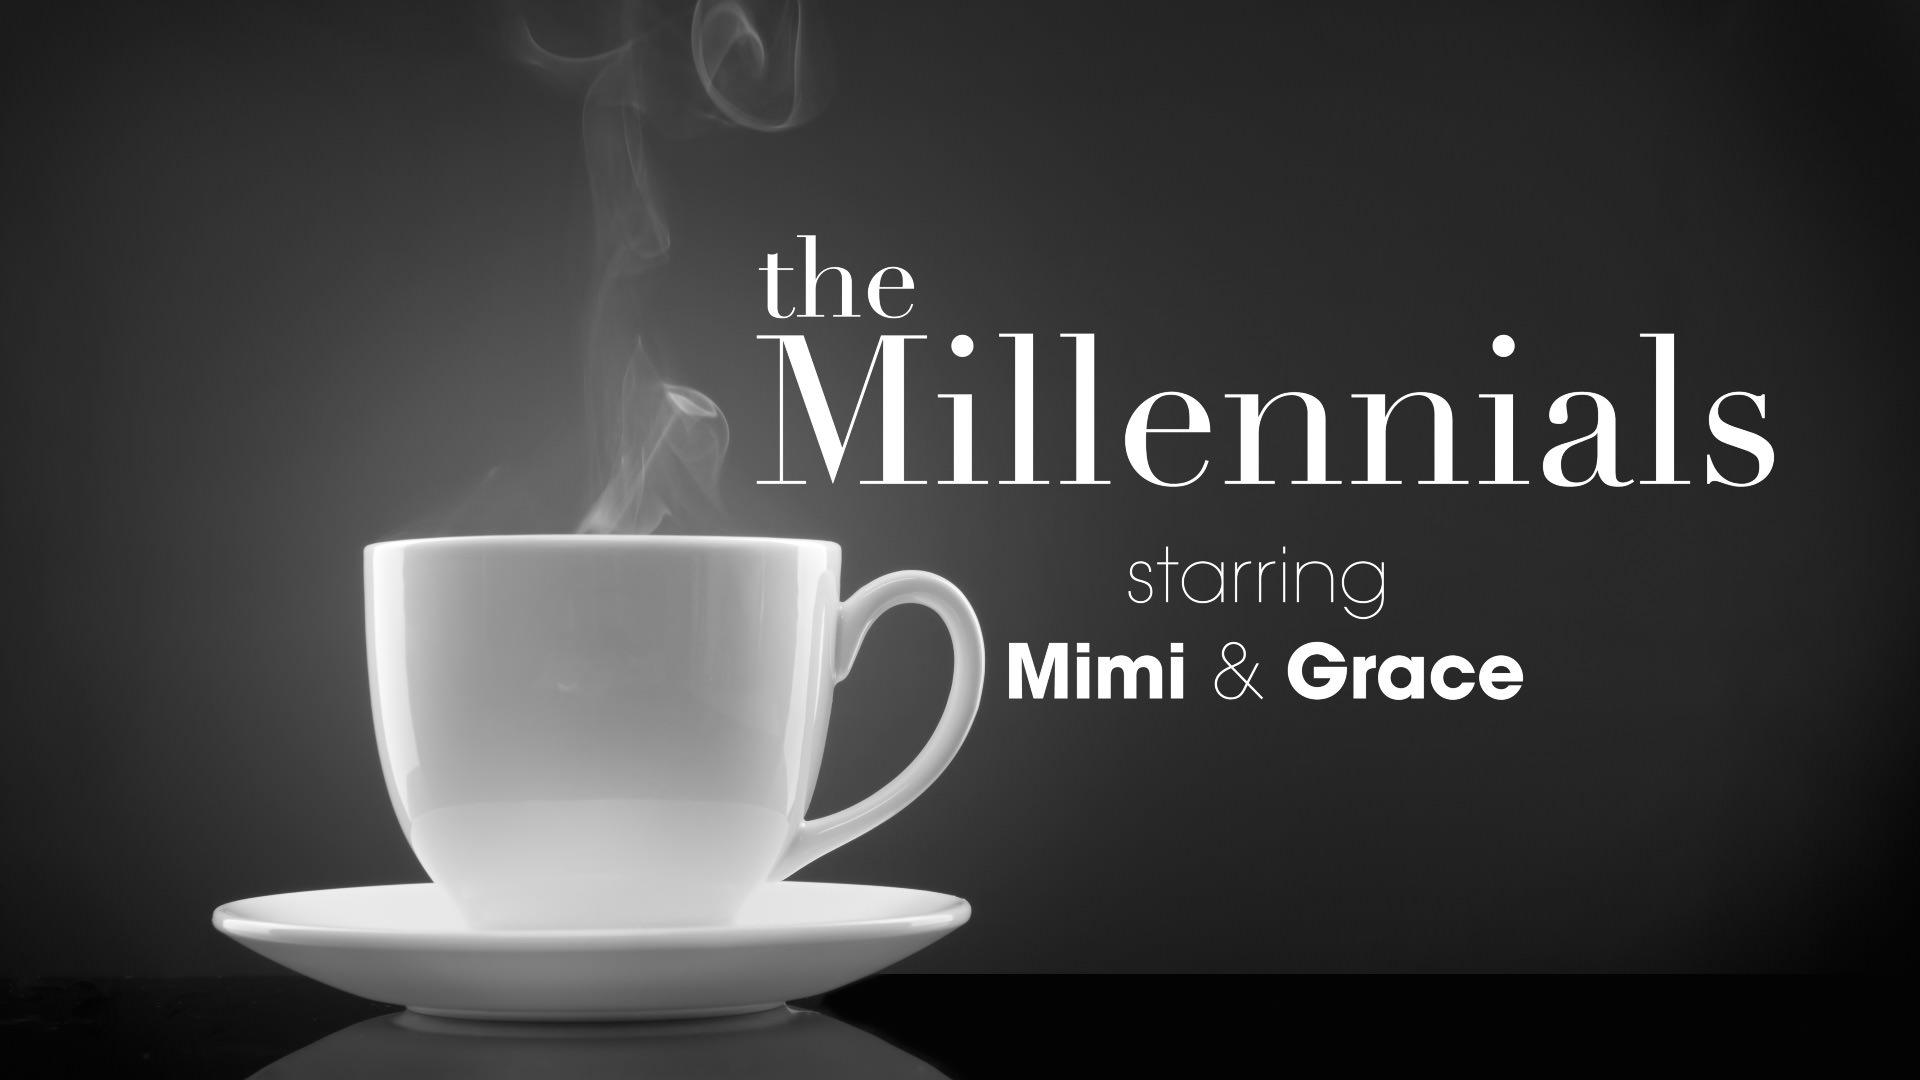 the Millennials - starring Mimi & Grace